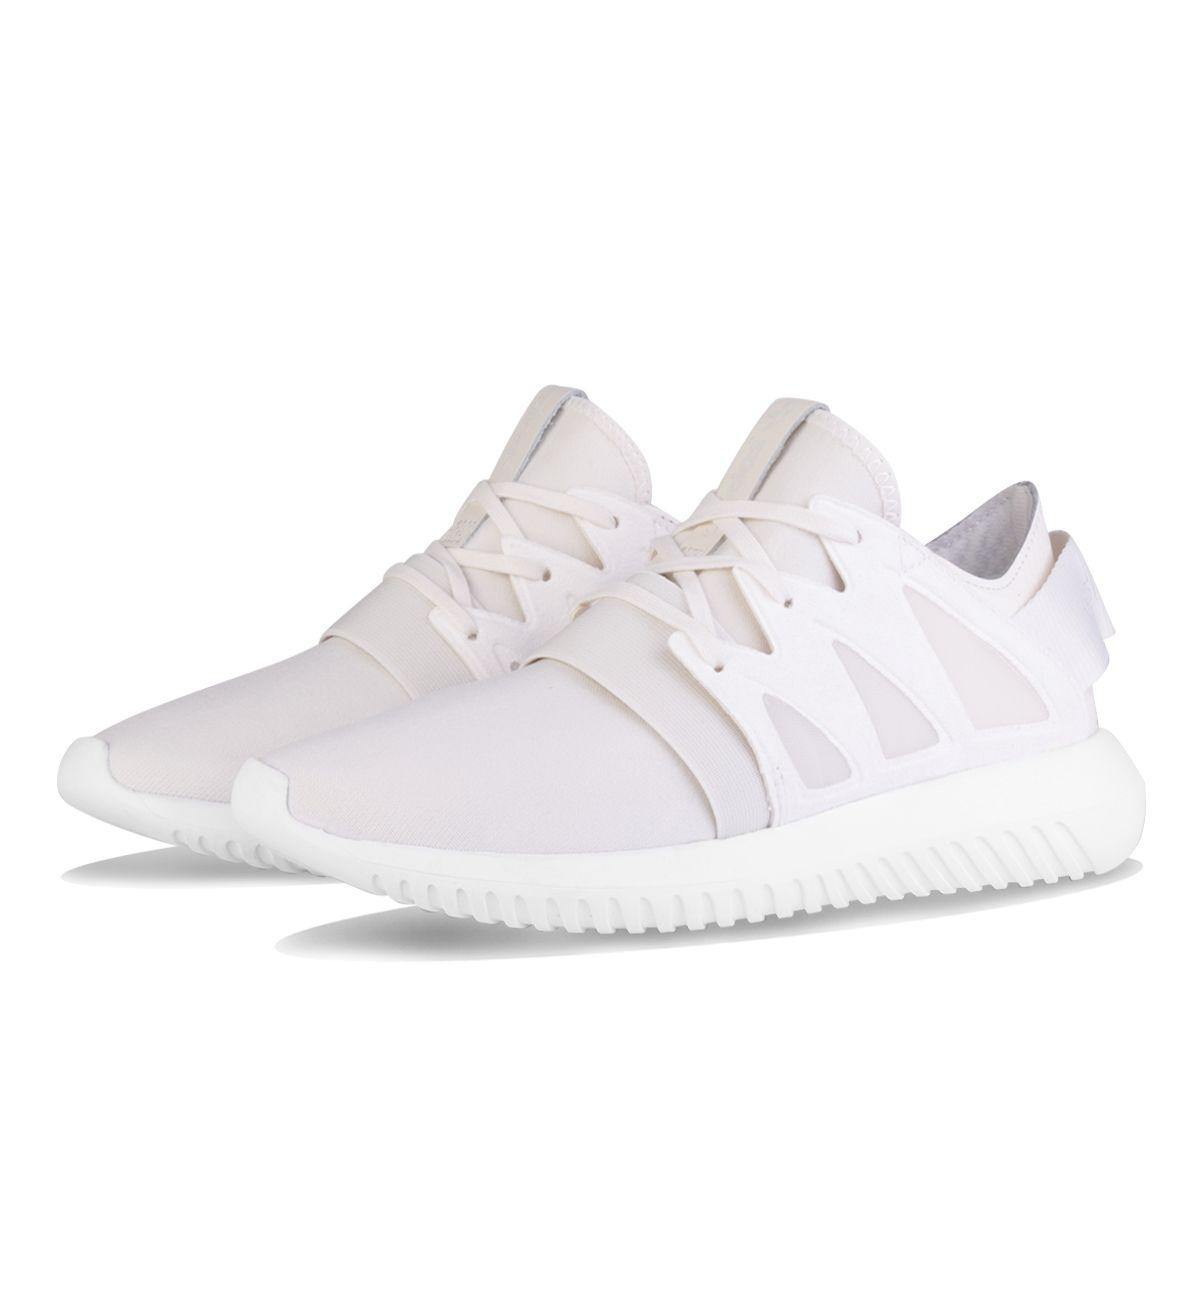 sale retailer 3c5f0 4da7b Adidas Originals WMNS Tubular Viral Chalk White   White - Adidas Womens